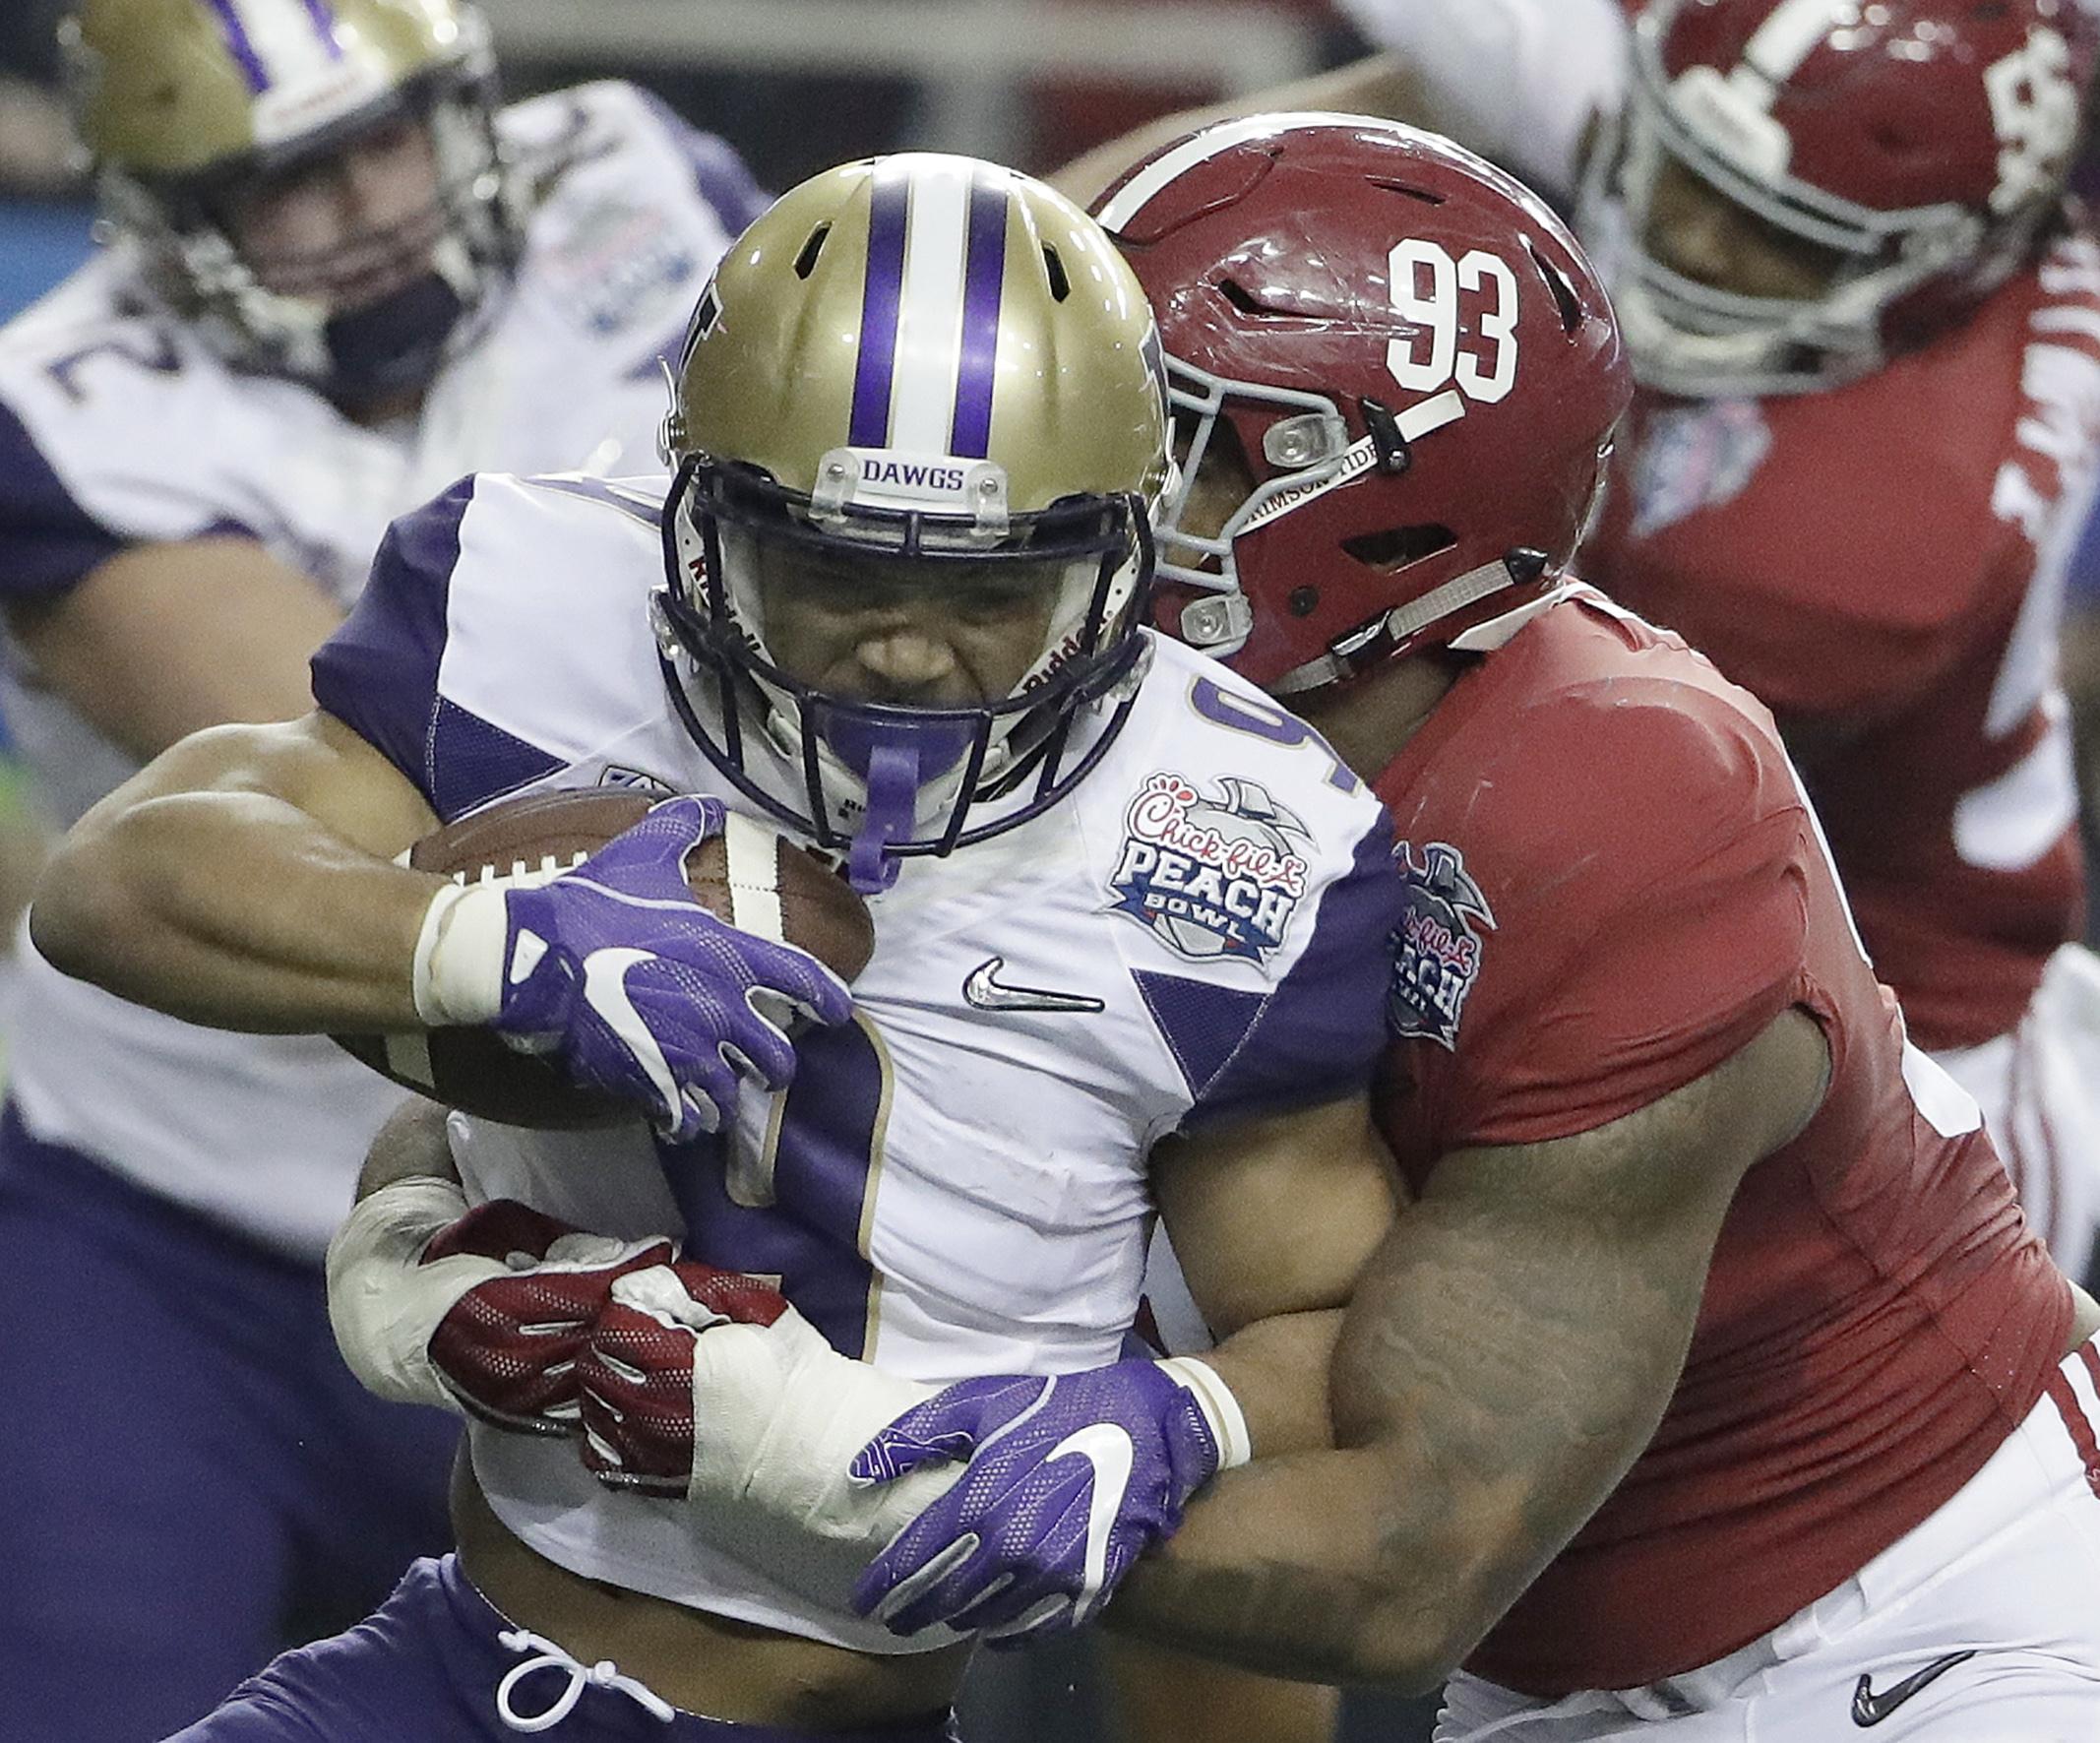 Alabama defensive lineman Jonathan Allen (93) tackles Washington running back Myles Gaskin (9) during the first half of the Peach Bowl NCAA college football playoff game, Saturday, Dec. 31, 2016, in Atlanta. (AP Photo/David Goldman)